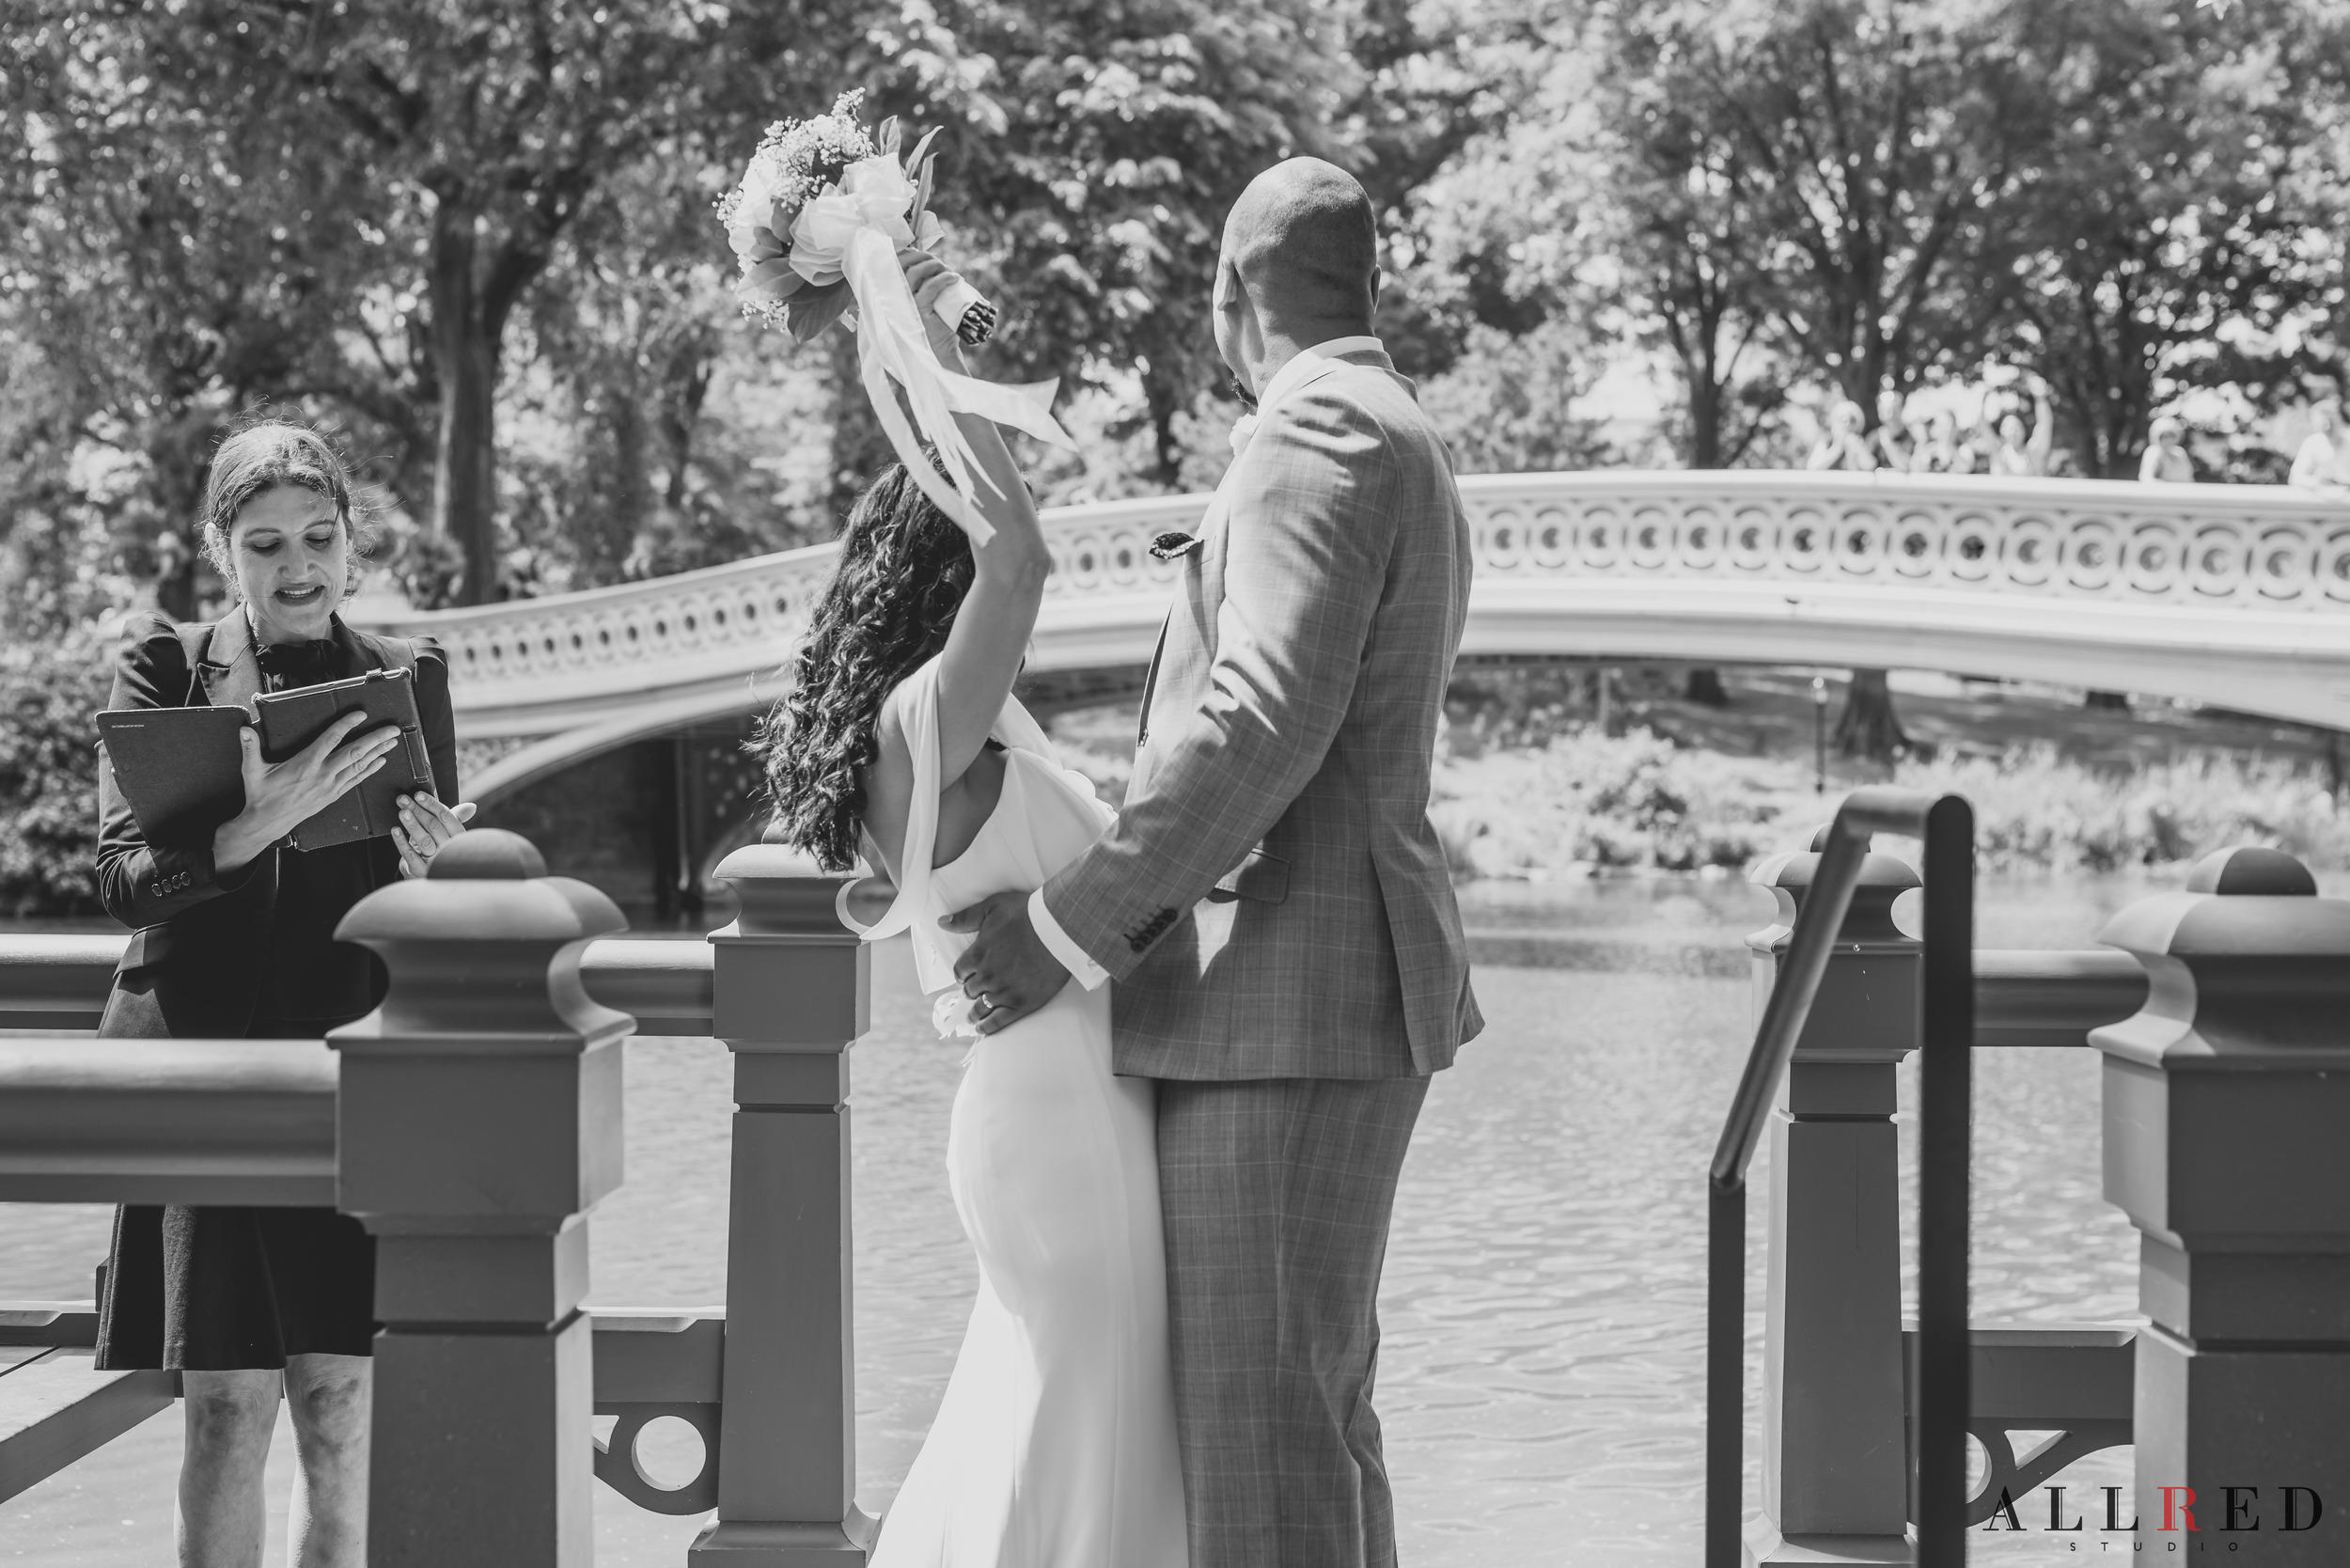 Wedding-central-park-allred-studio-new-york-photographer-new-jersey-hudson-valley-2161.jpg